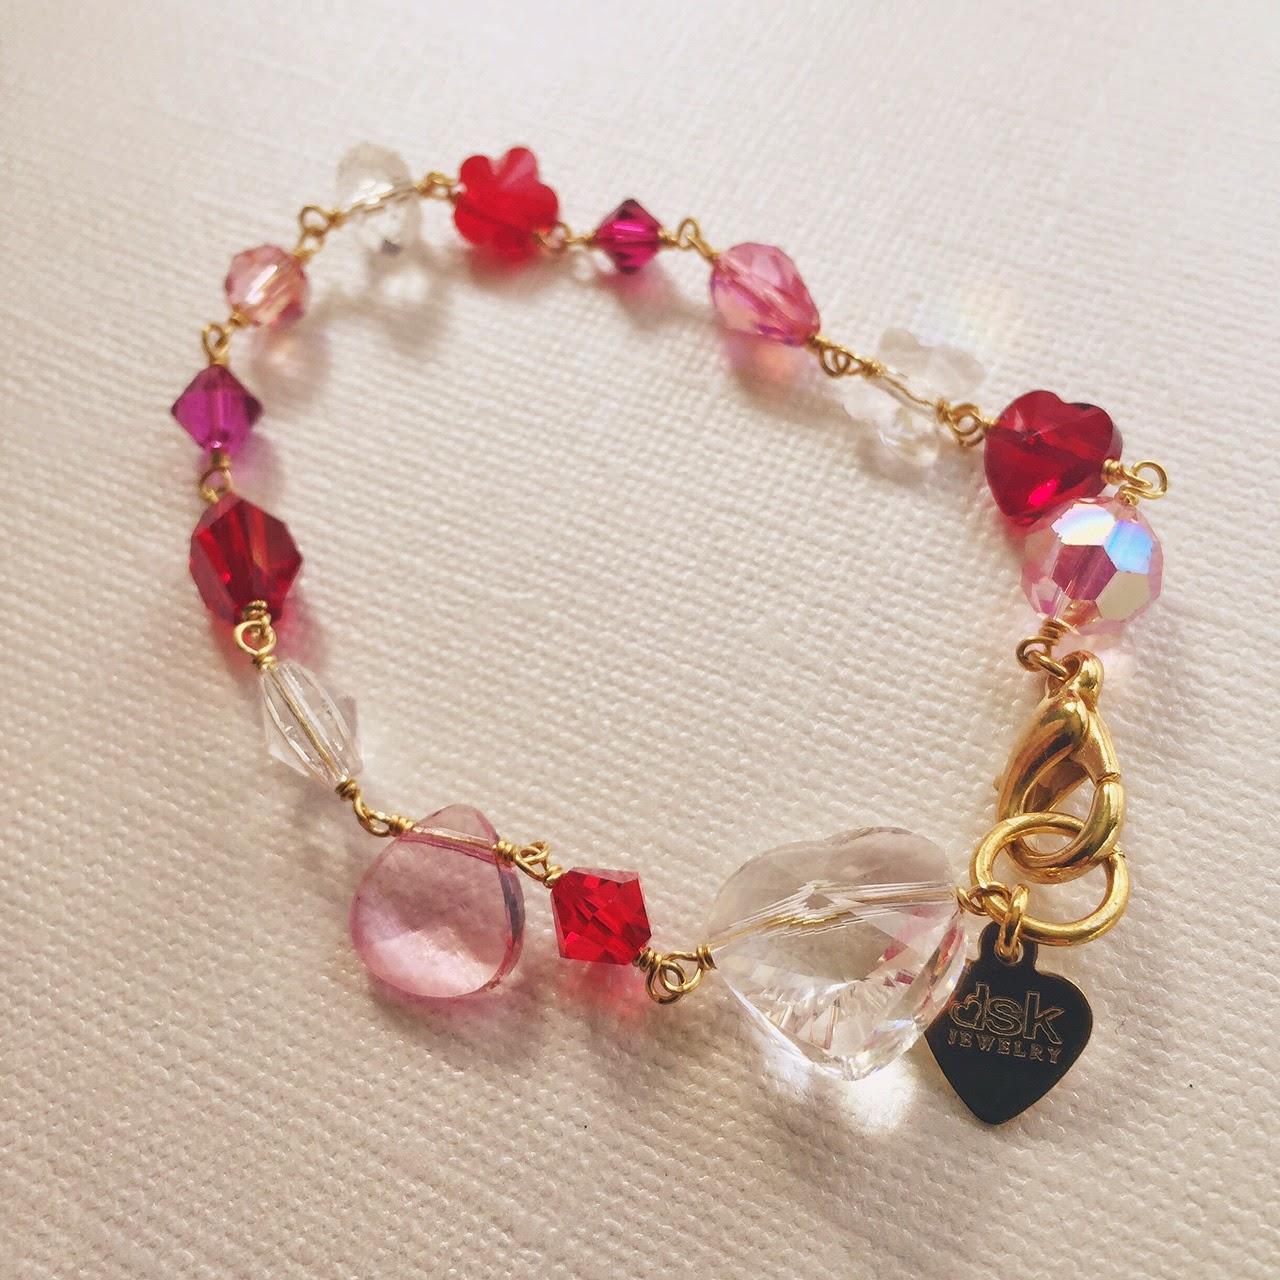 DSK Jewelry